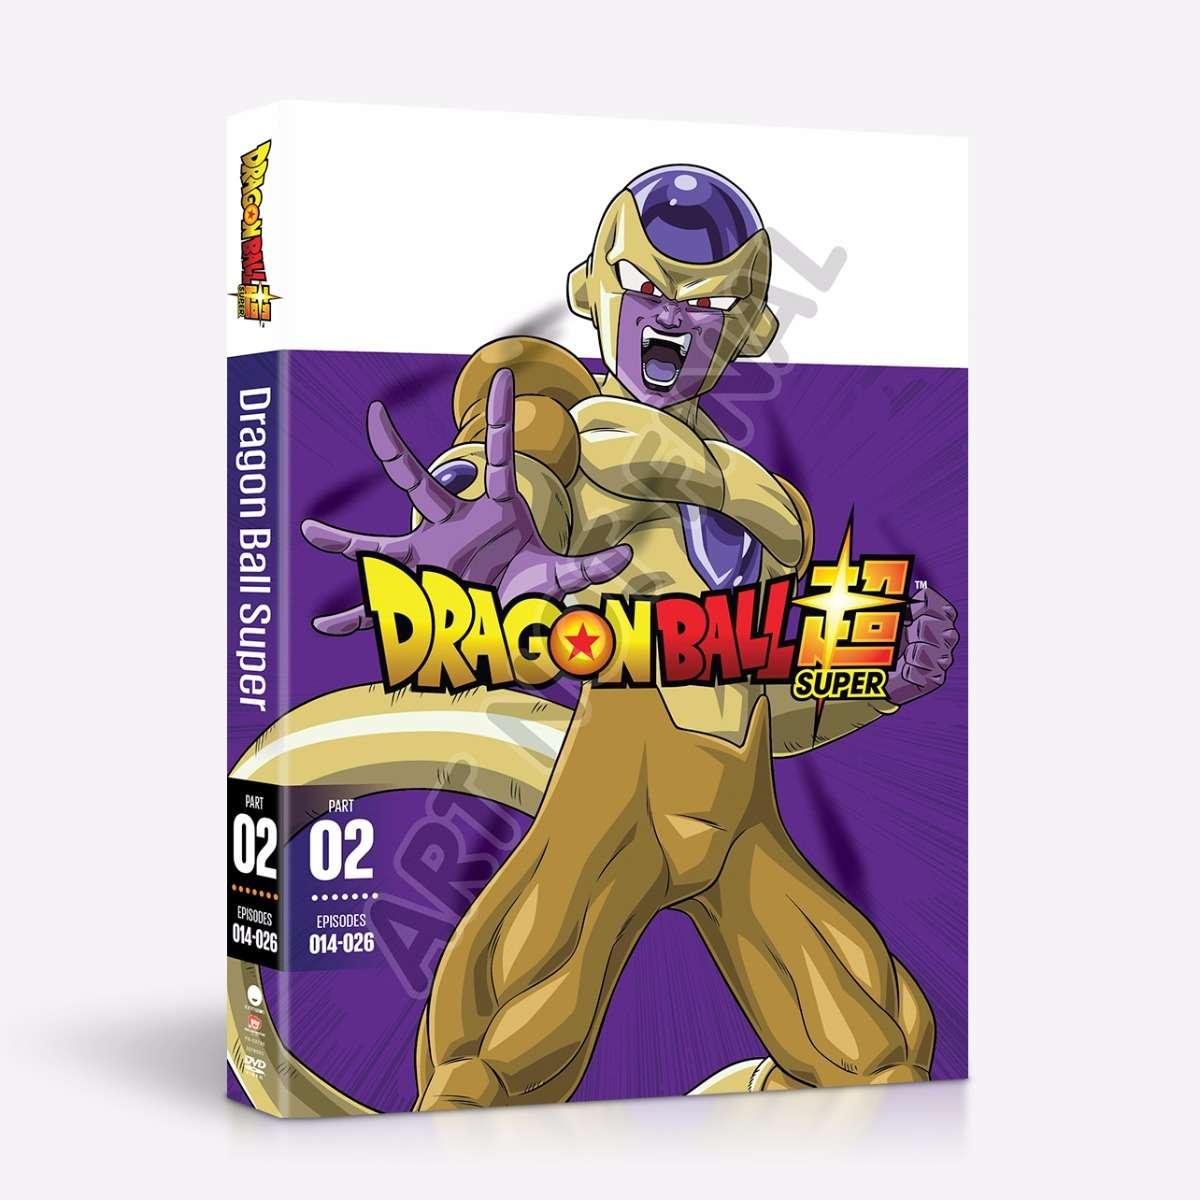 Part Two - DVD blu-ray-dvd